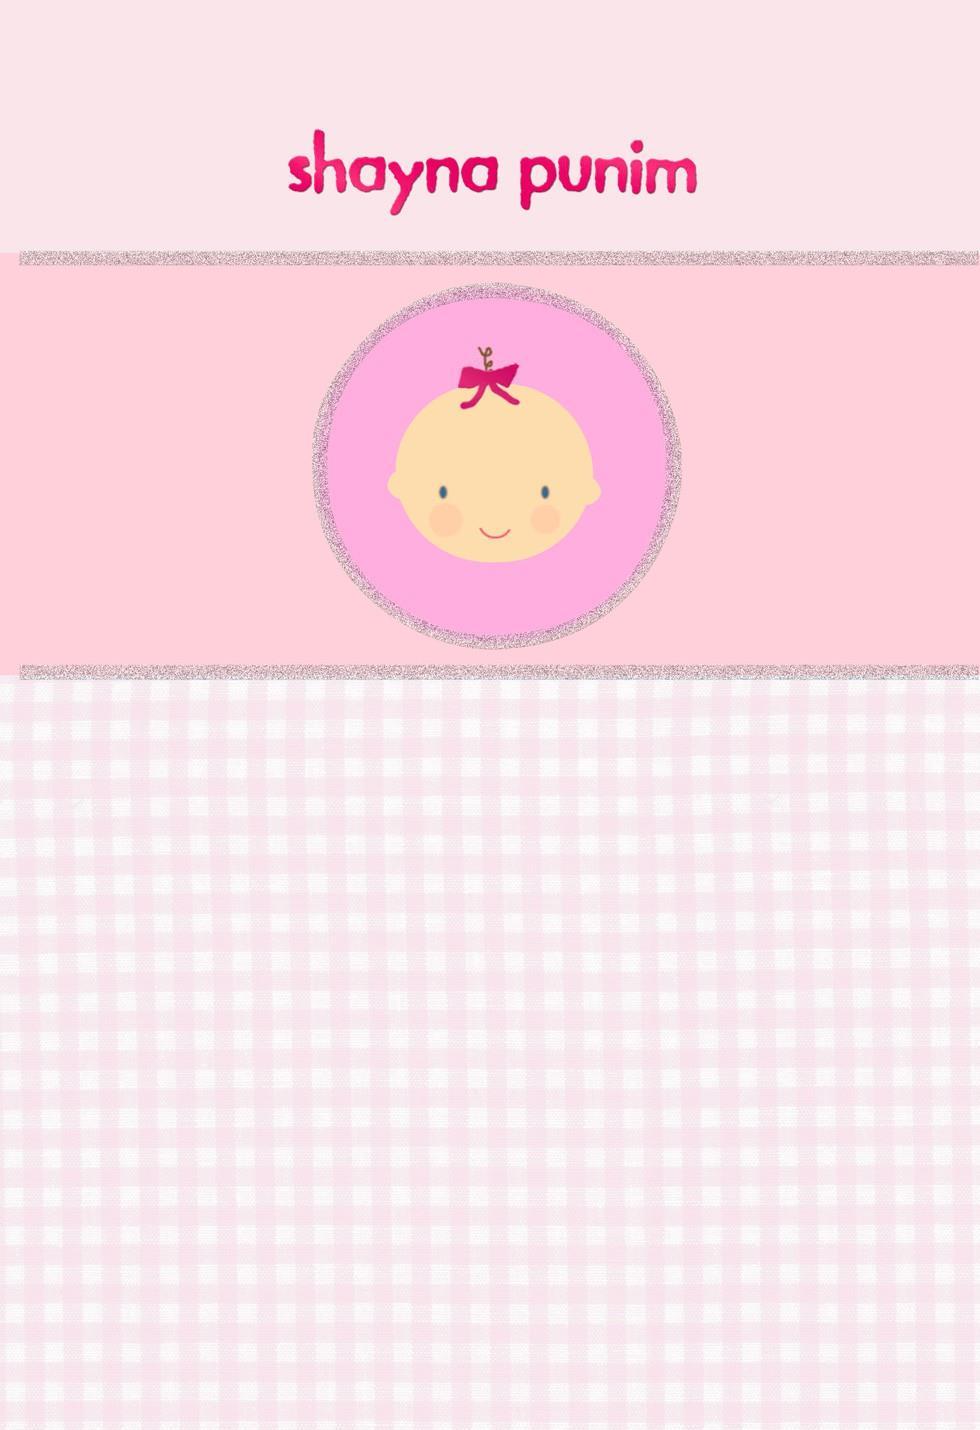 Gracious Shayna Punim Baby Girl Congratulations Card Shayna Punim Baby Girl Congratulations Card Greeting Cards Hallmark Congratulations Baby Girl Quotes Congratulations Baby Girl Messages baby shower Congratulations Baby Girl